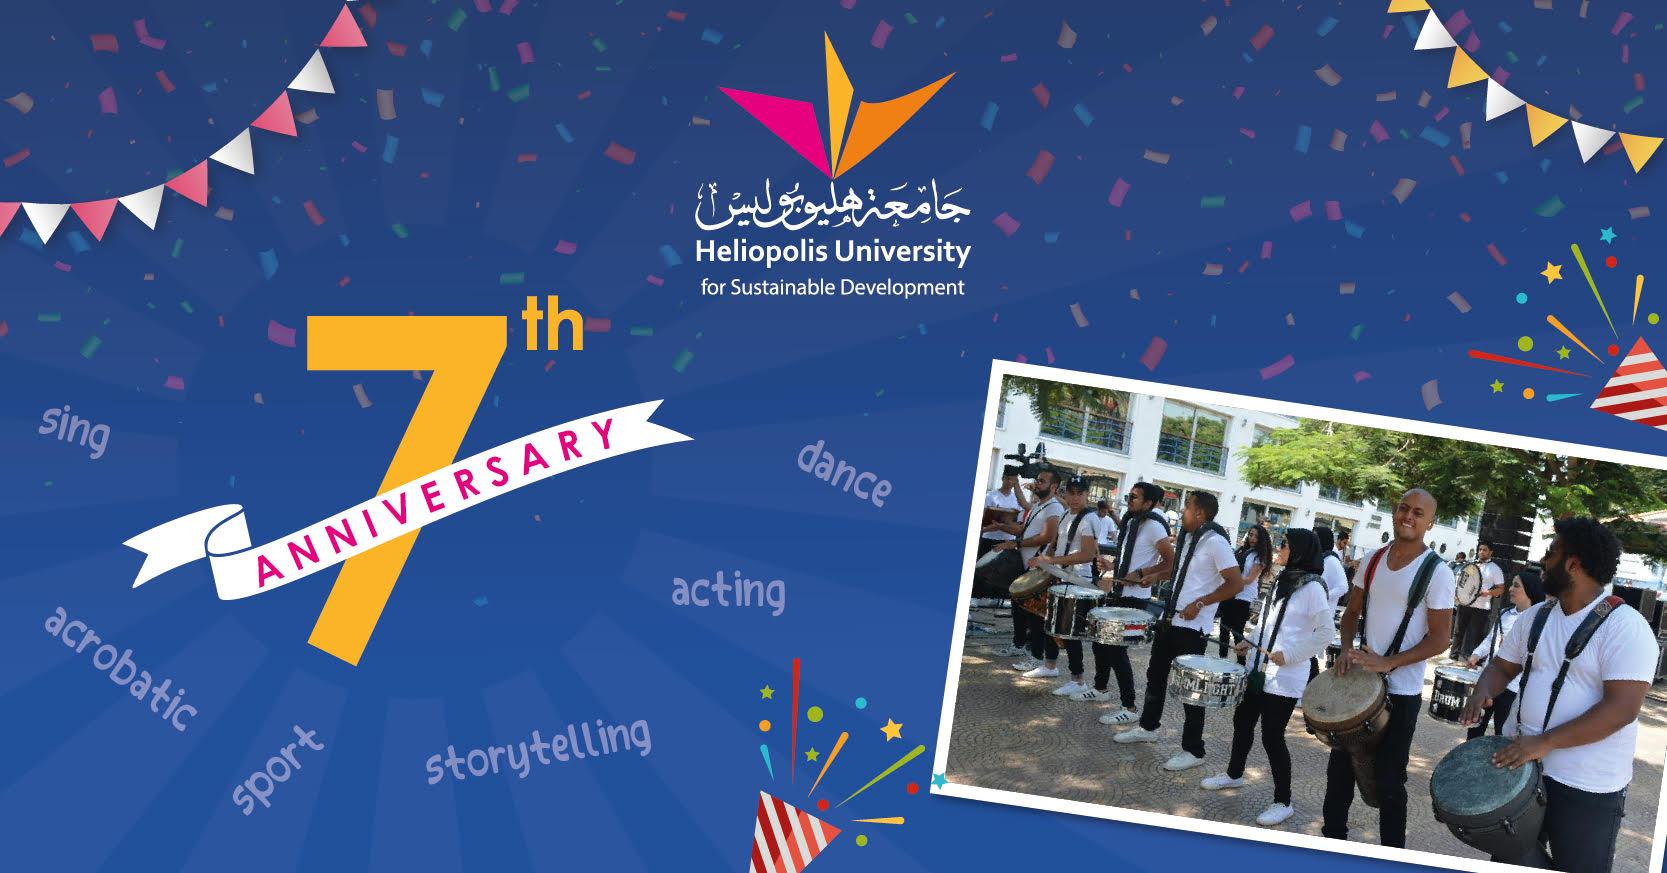 7th Anniversary of Heliopolis University